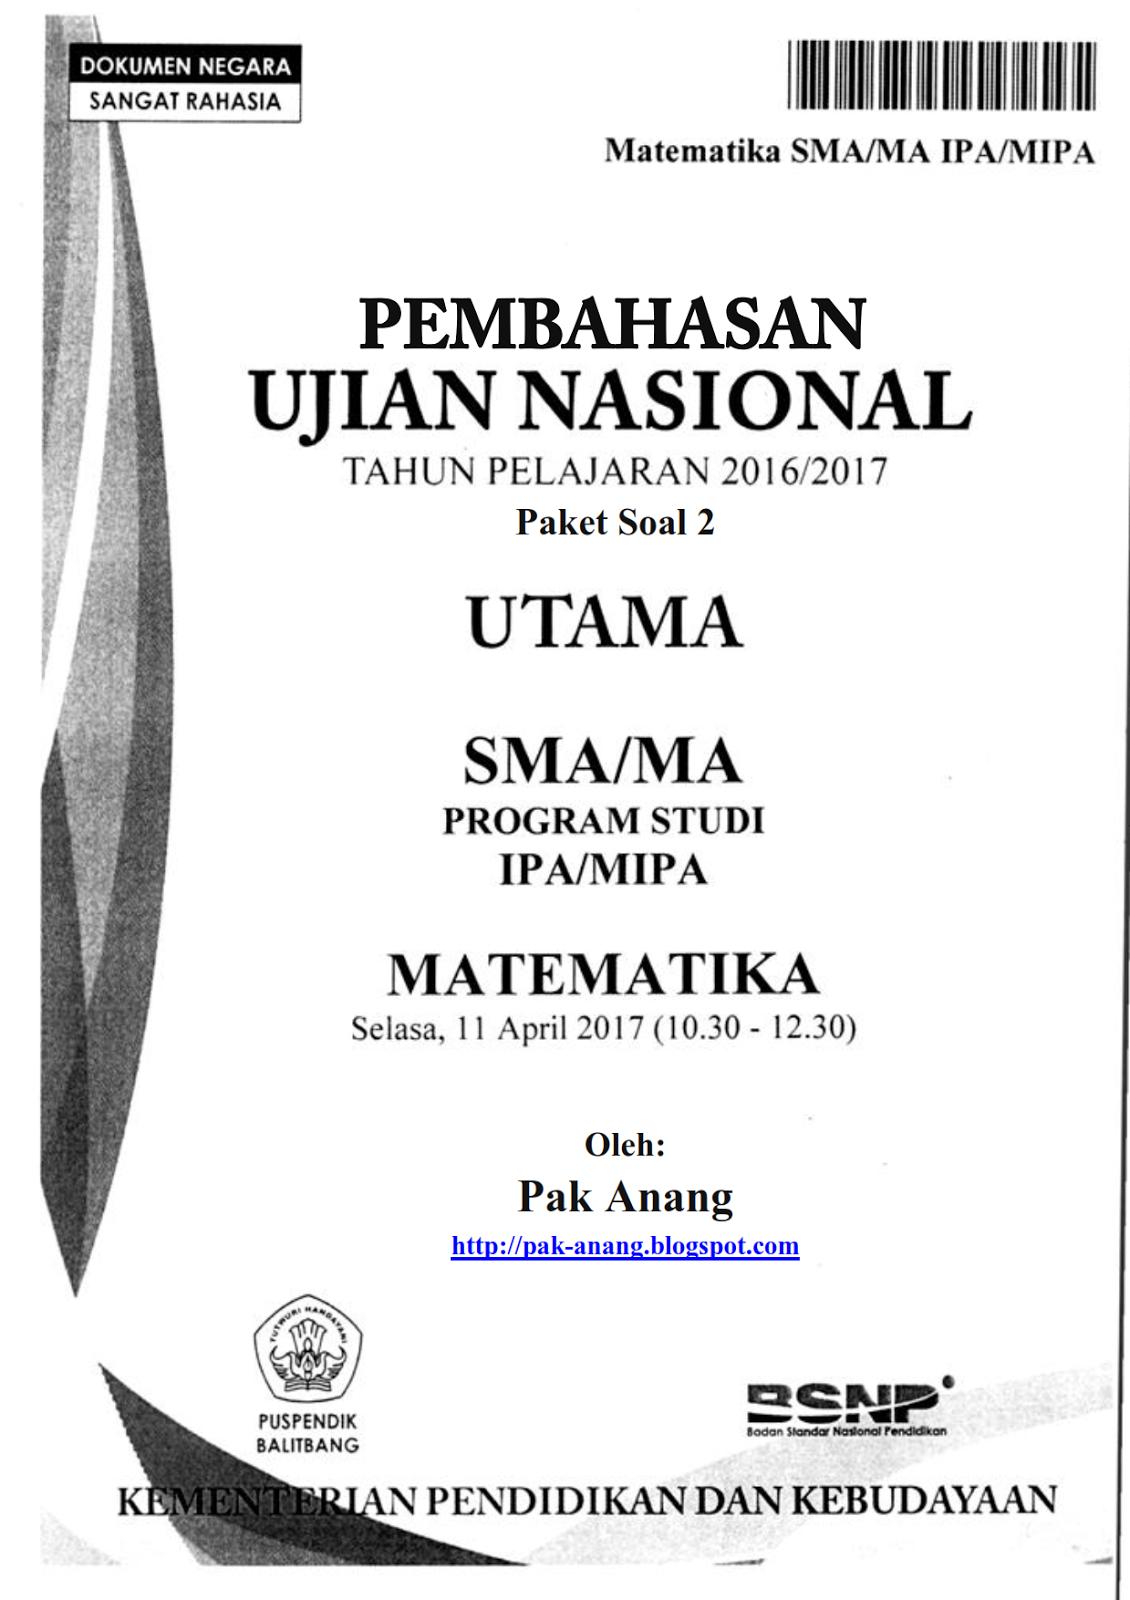 Un Matematika Sma 2018 : matematika, Berbagi, Belajar:, Pembahasan, Matematika, Program, (TRIK, SUPERKILAT), (Paket